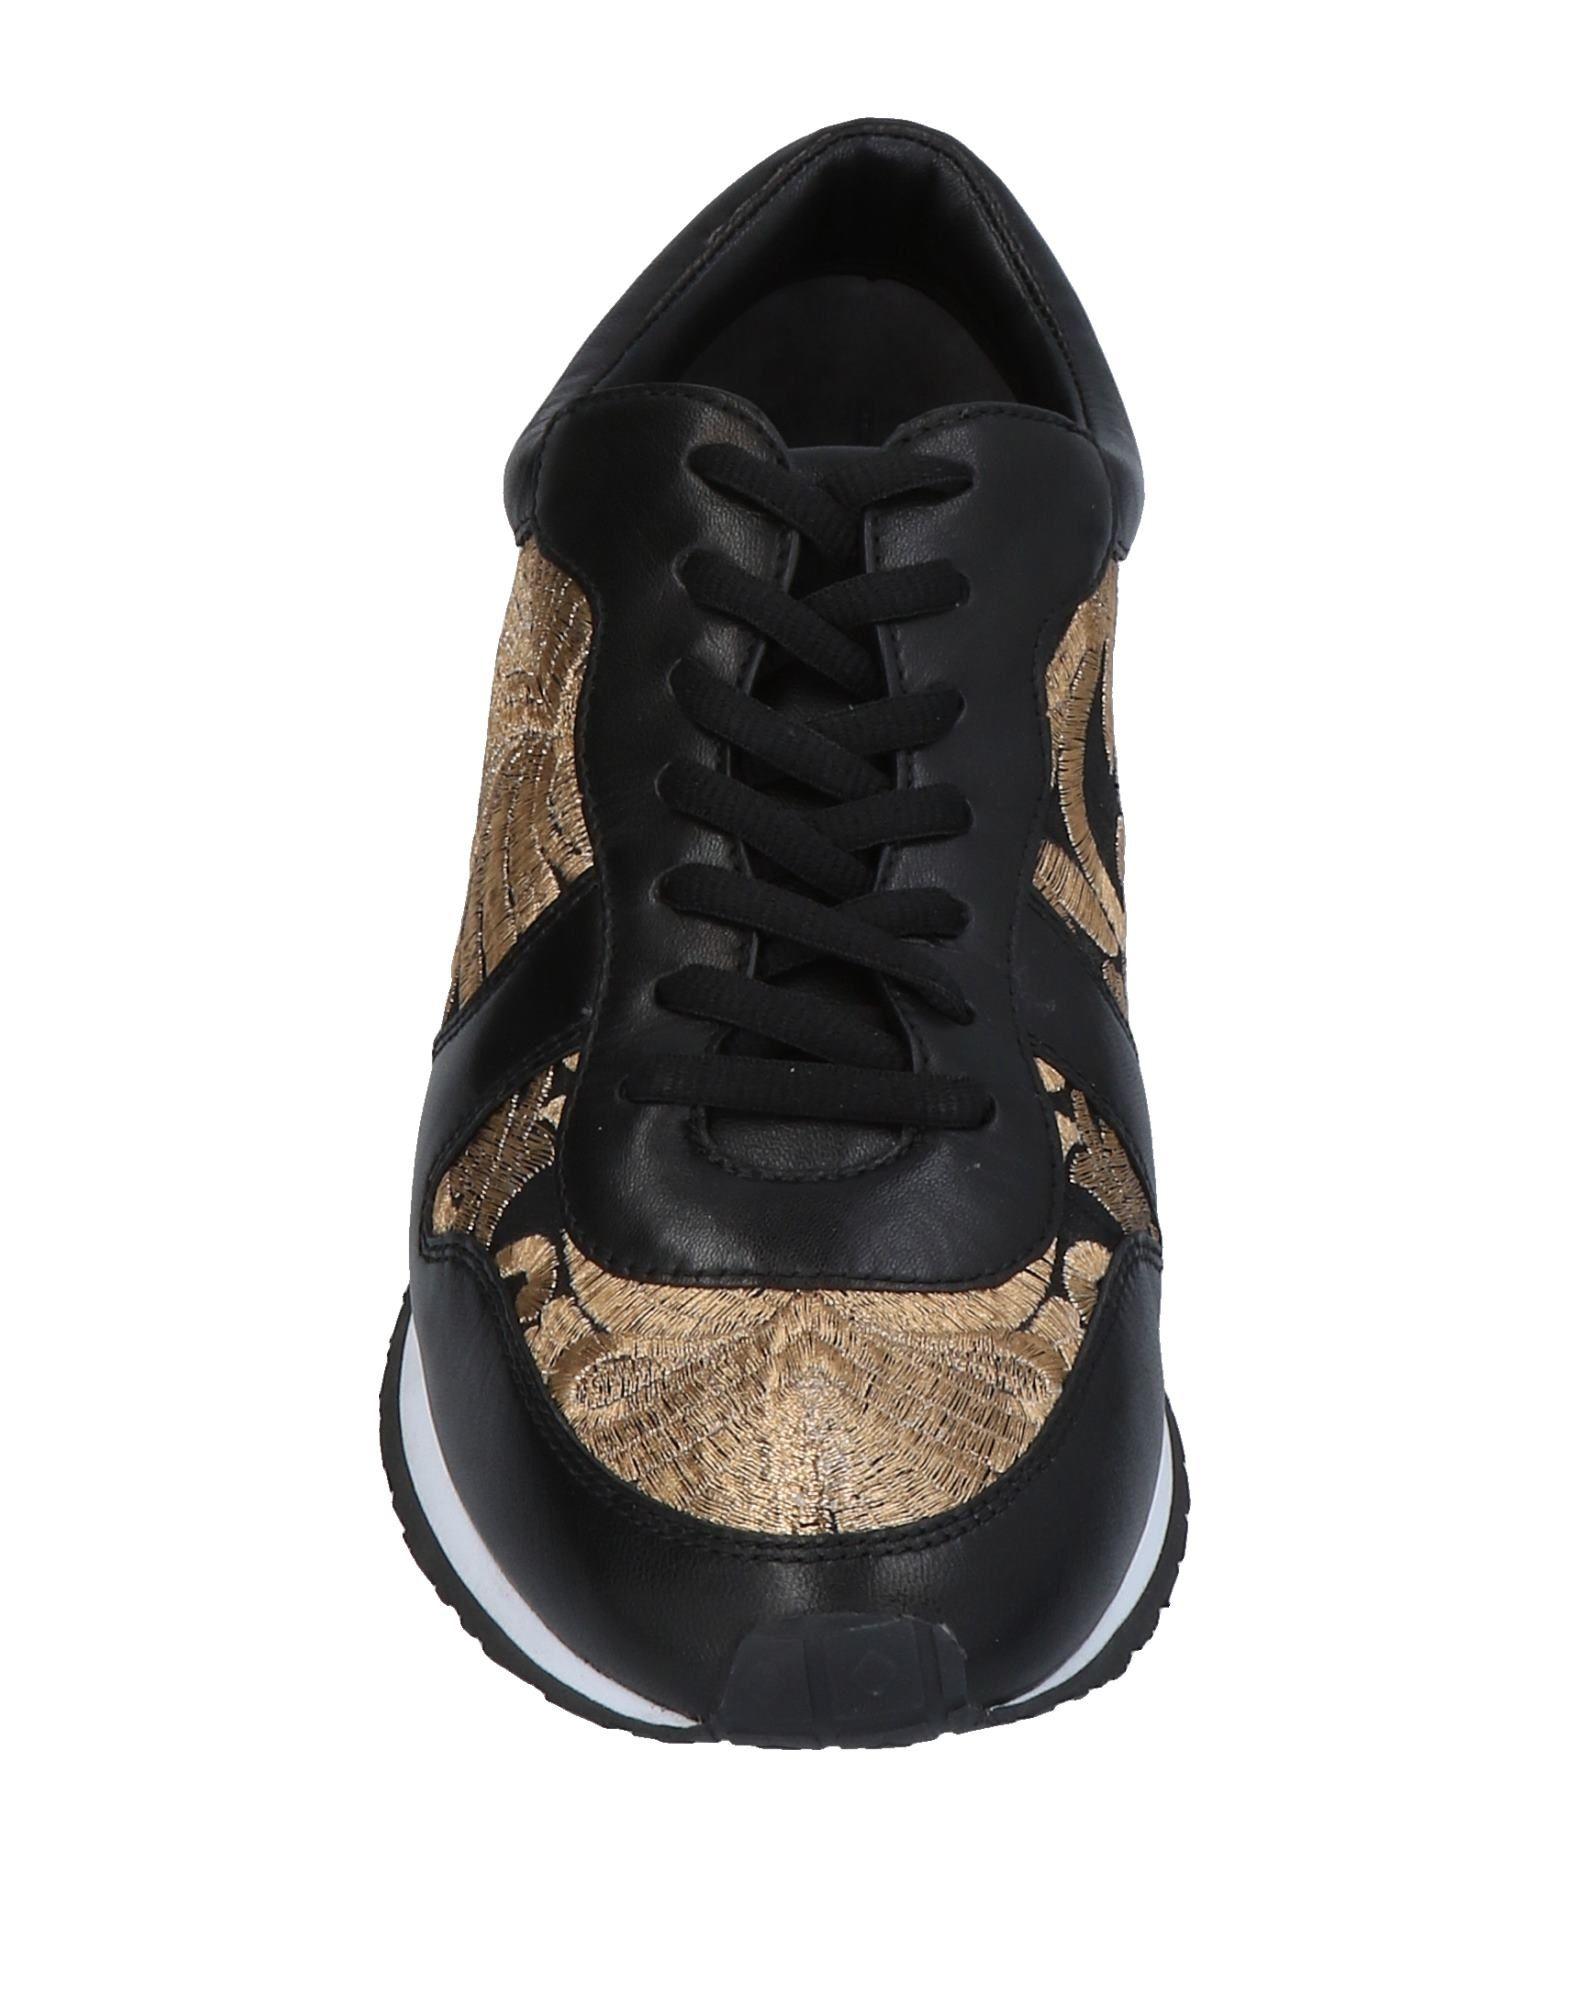 Tory Burch Sneakers - Women Tory Tory Tory Burch Sneakers online on  United Kingdom - 11453281WE d3122b